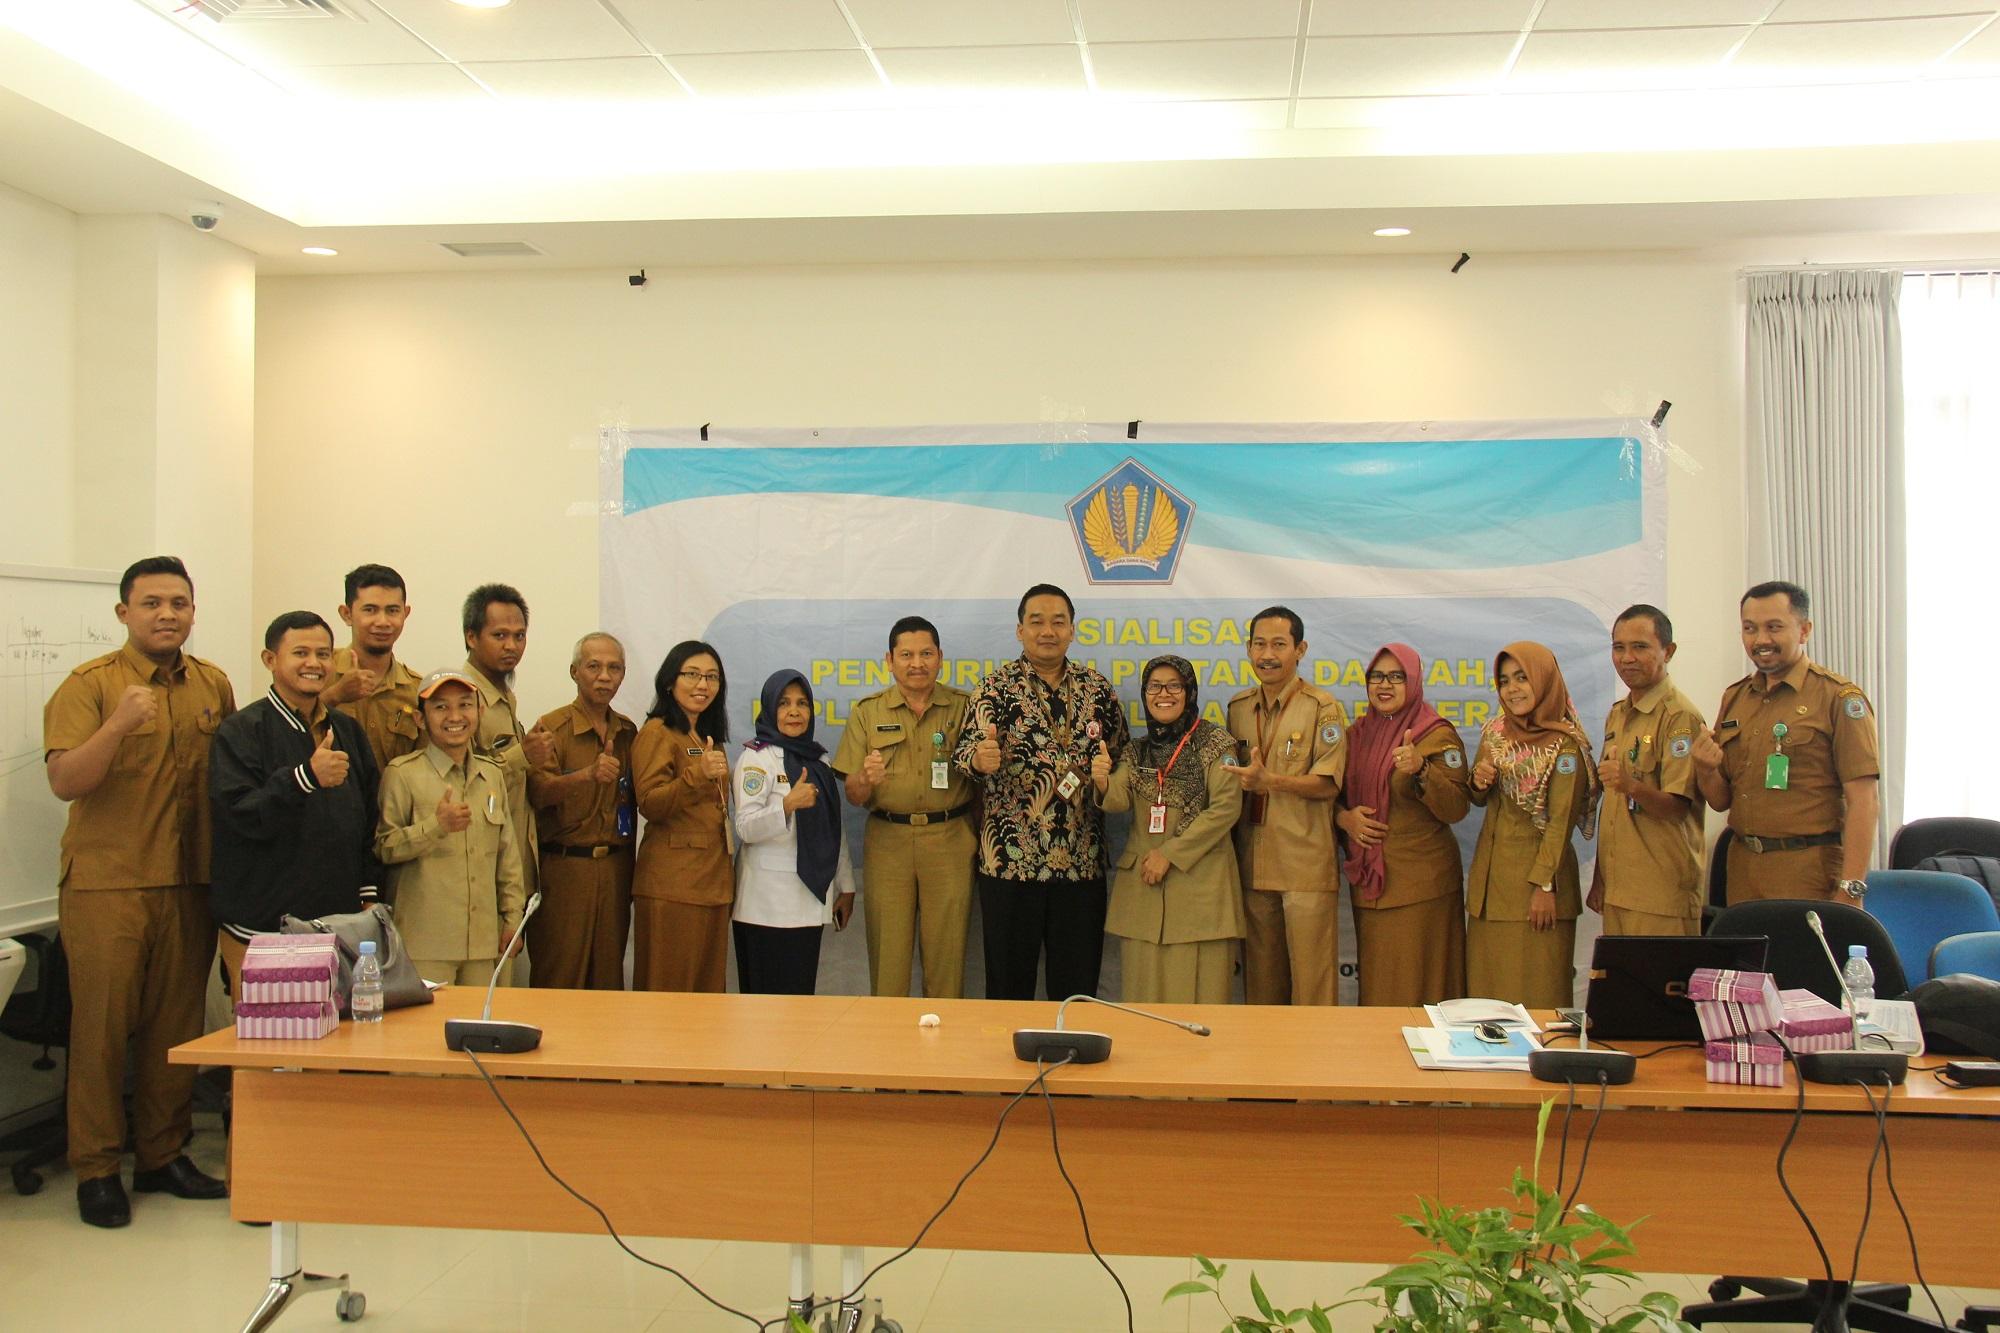 Sosialisasi Pengurusan Piutang Daerah dan PMK-82/KN.06/2019 serta Launching Inovasi Aplikasi siAPPSERAH di Pemerintah Kota Bontang